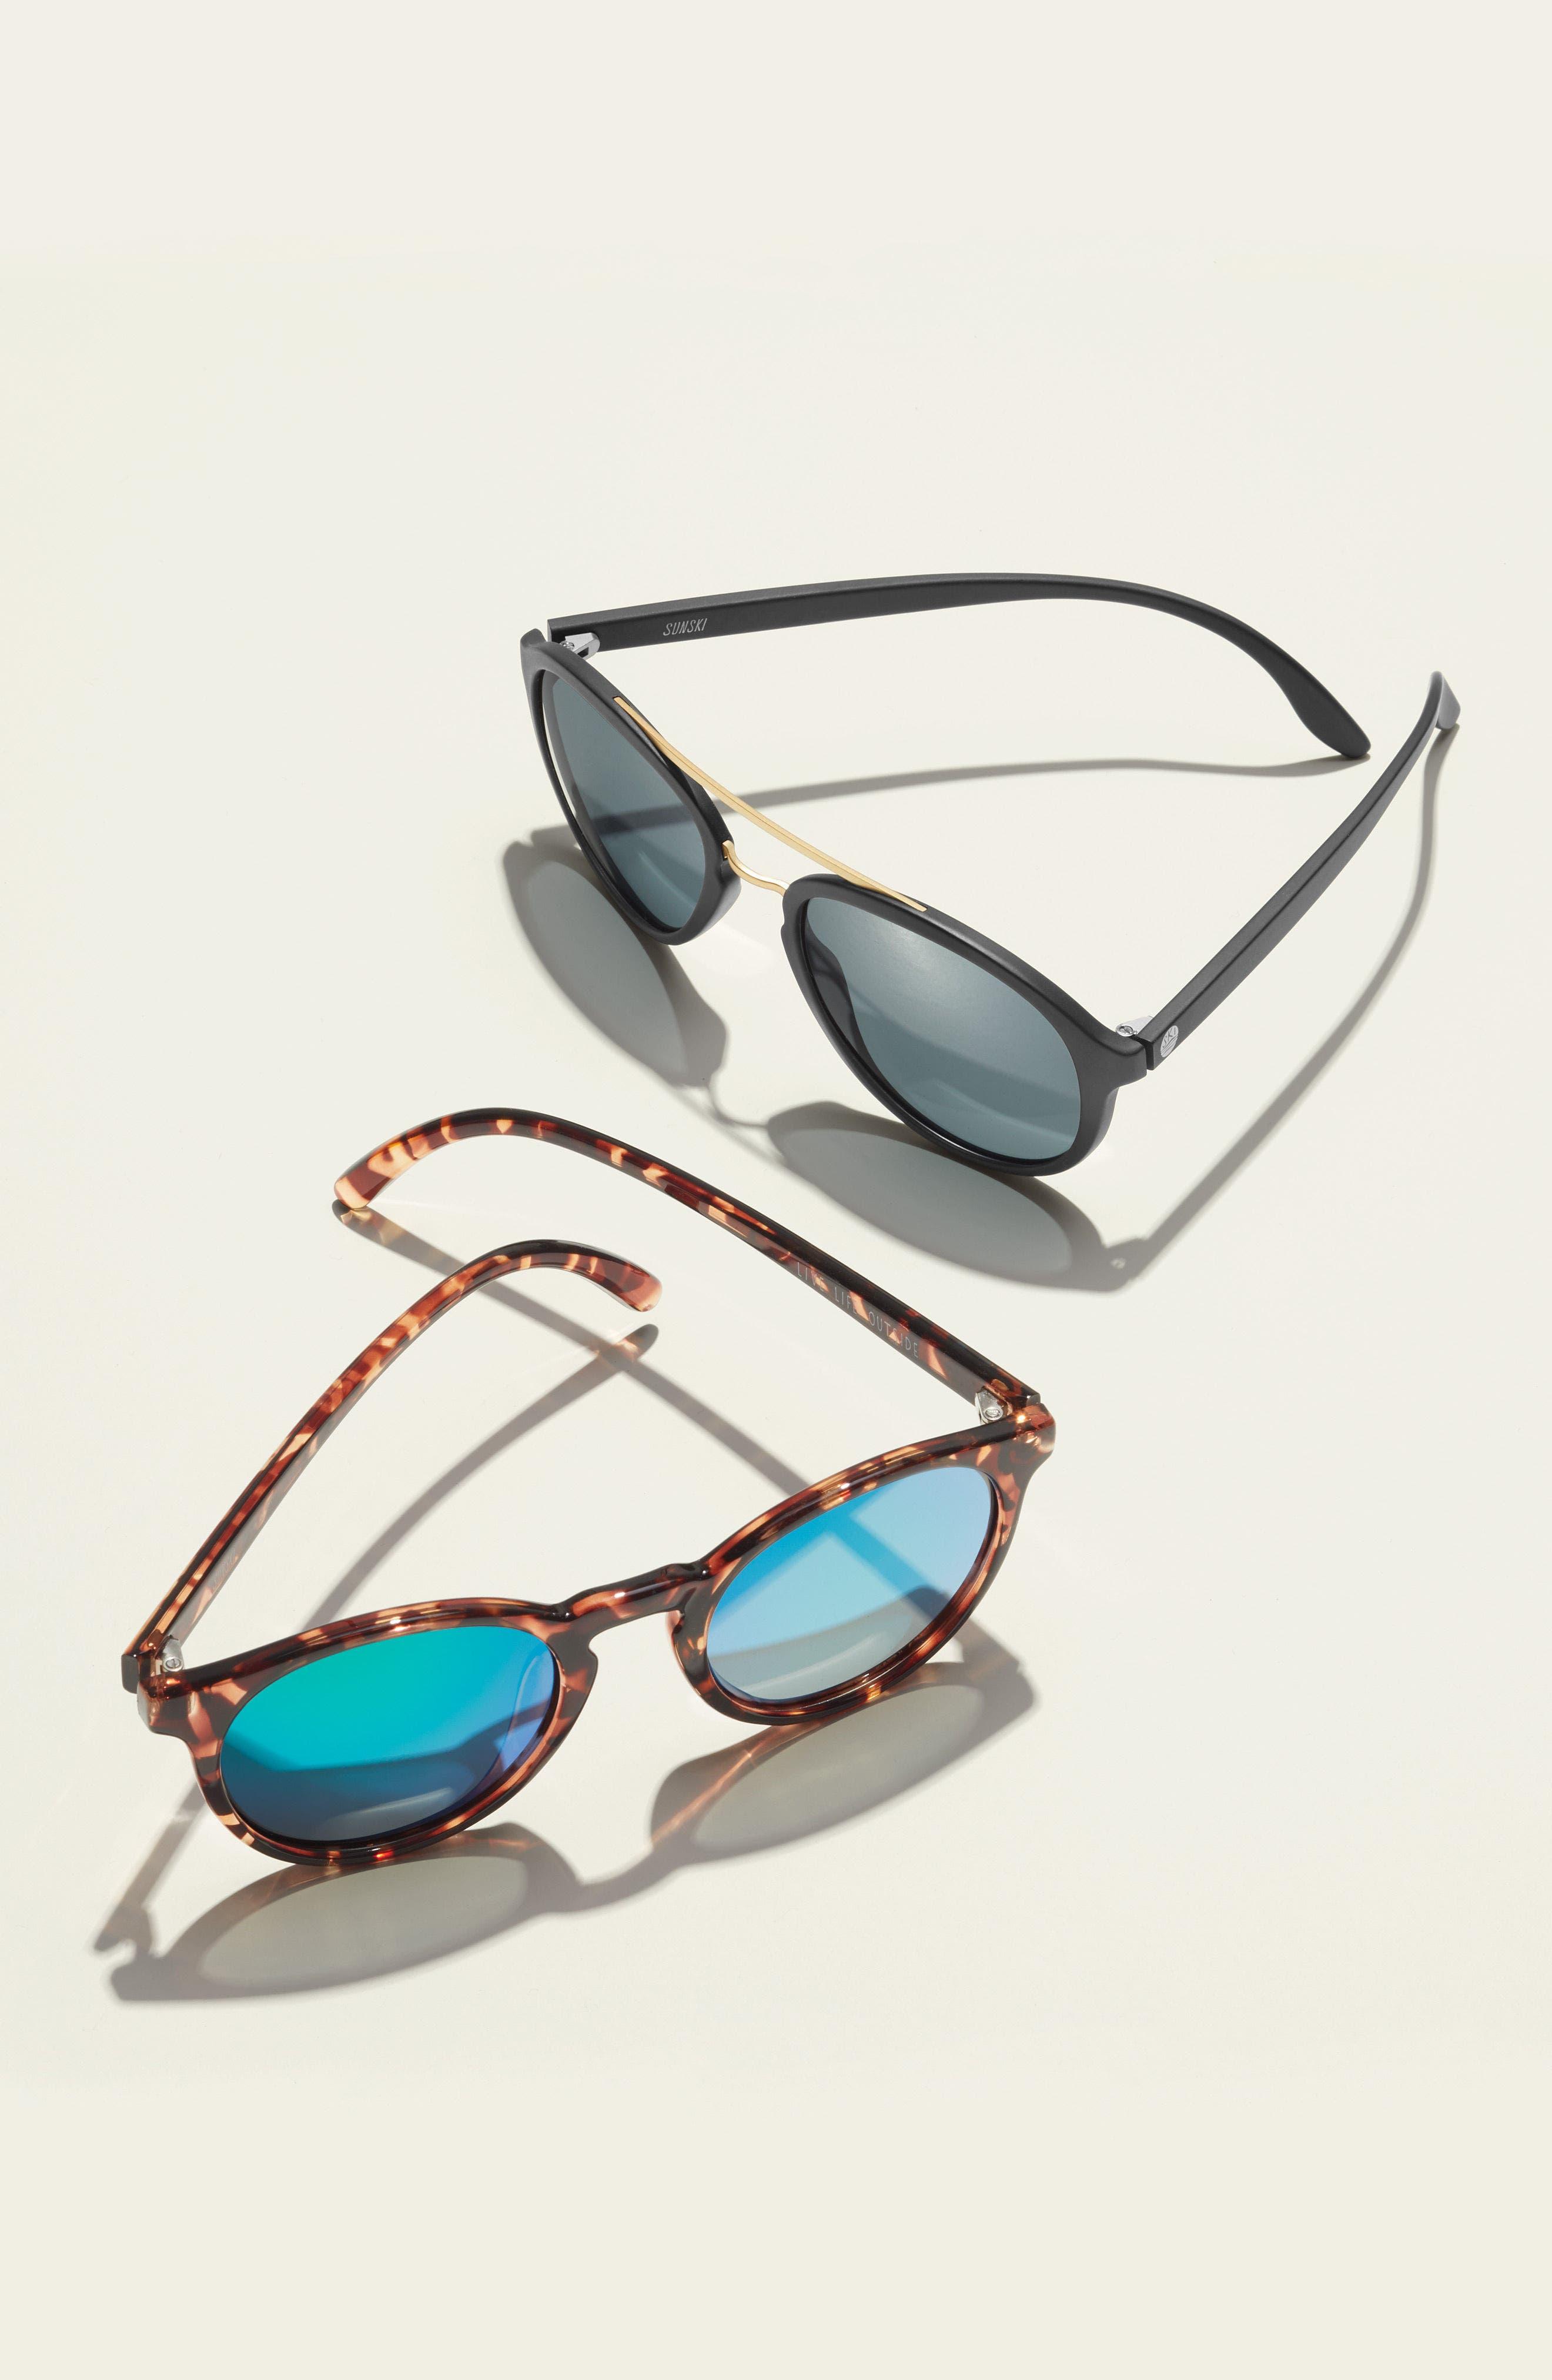 Plover 60mm Polarized Sunglasses,                             Alternate thumbnail 3, color,                             BLACK/ SLATE